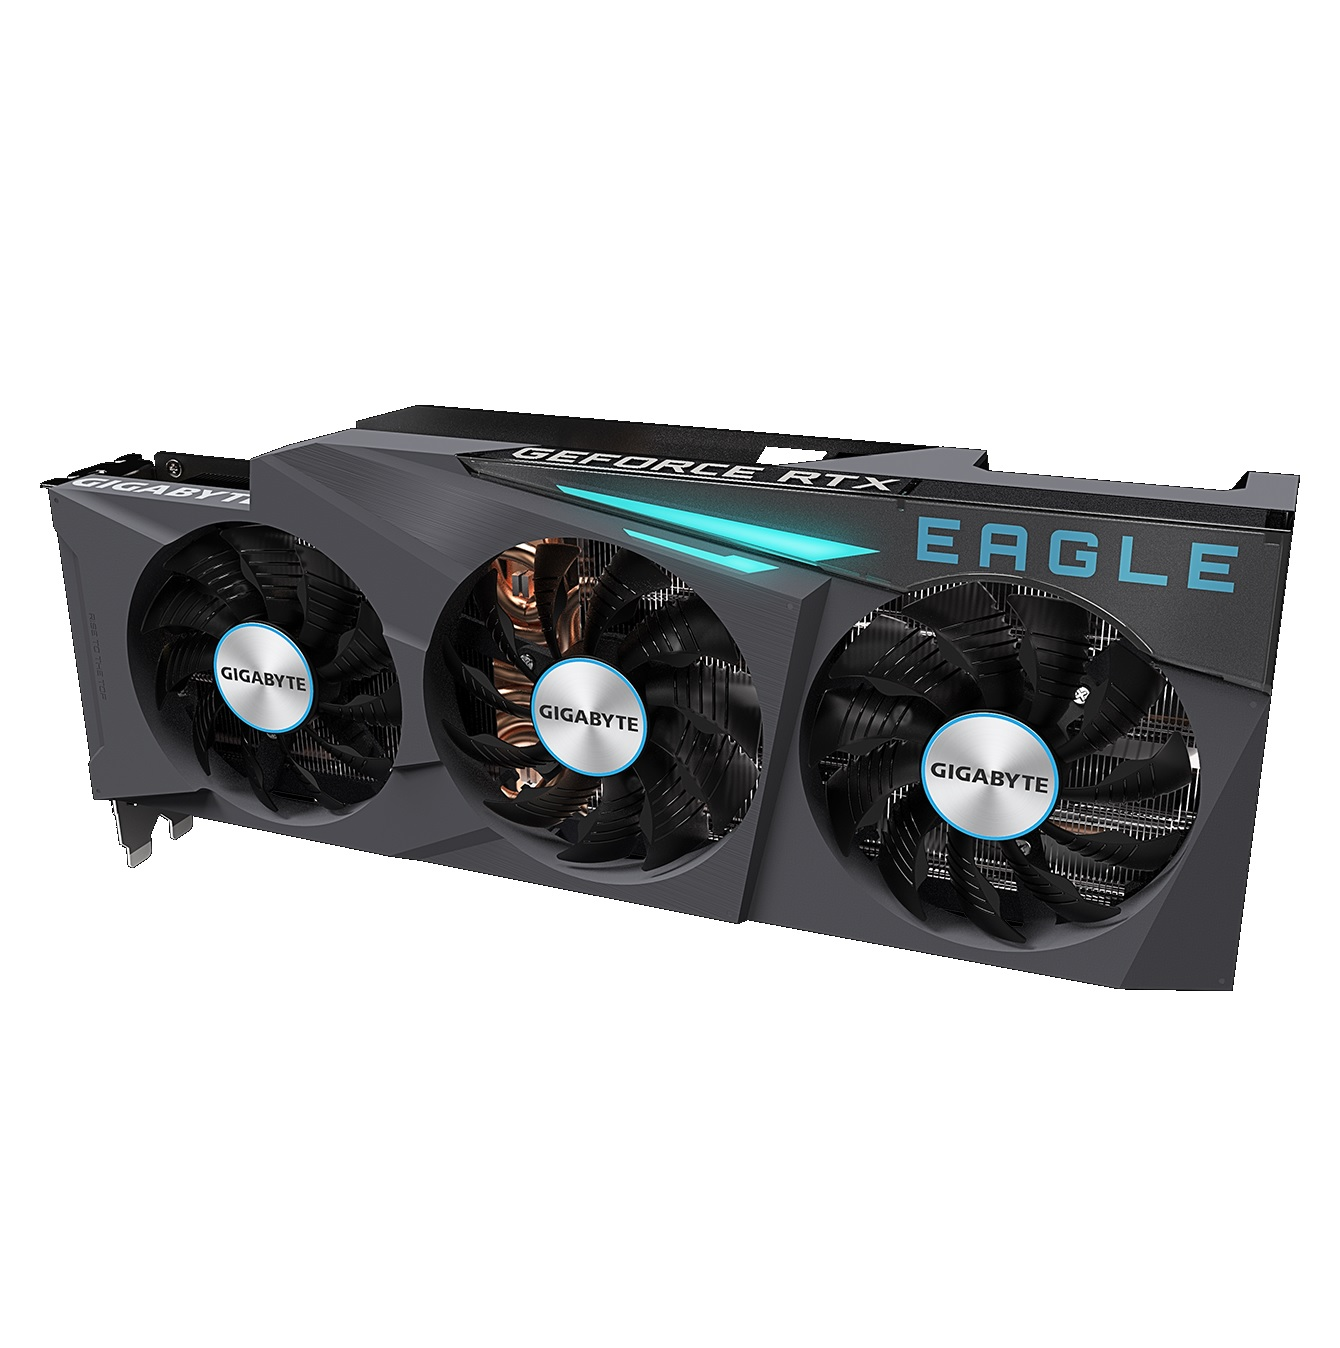 Gigabyte GeForce RTX 3080 Ti Eagle Graphics Card